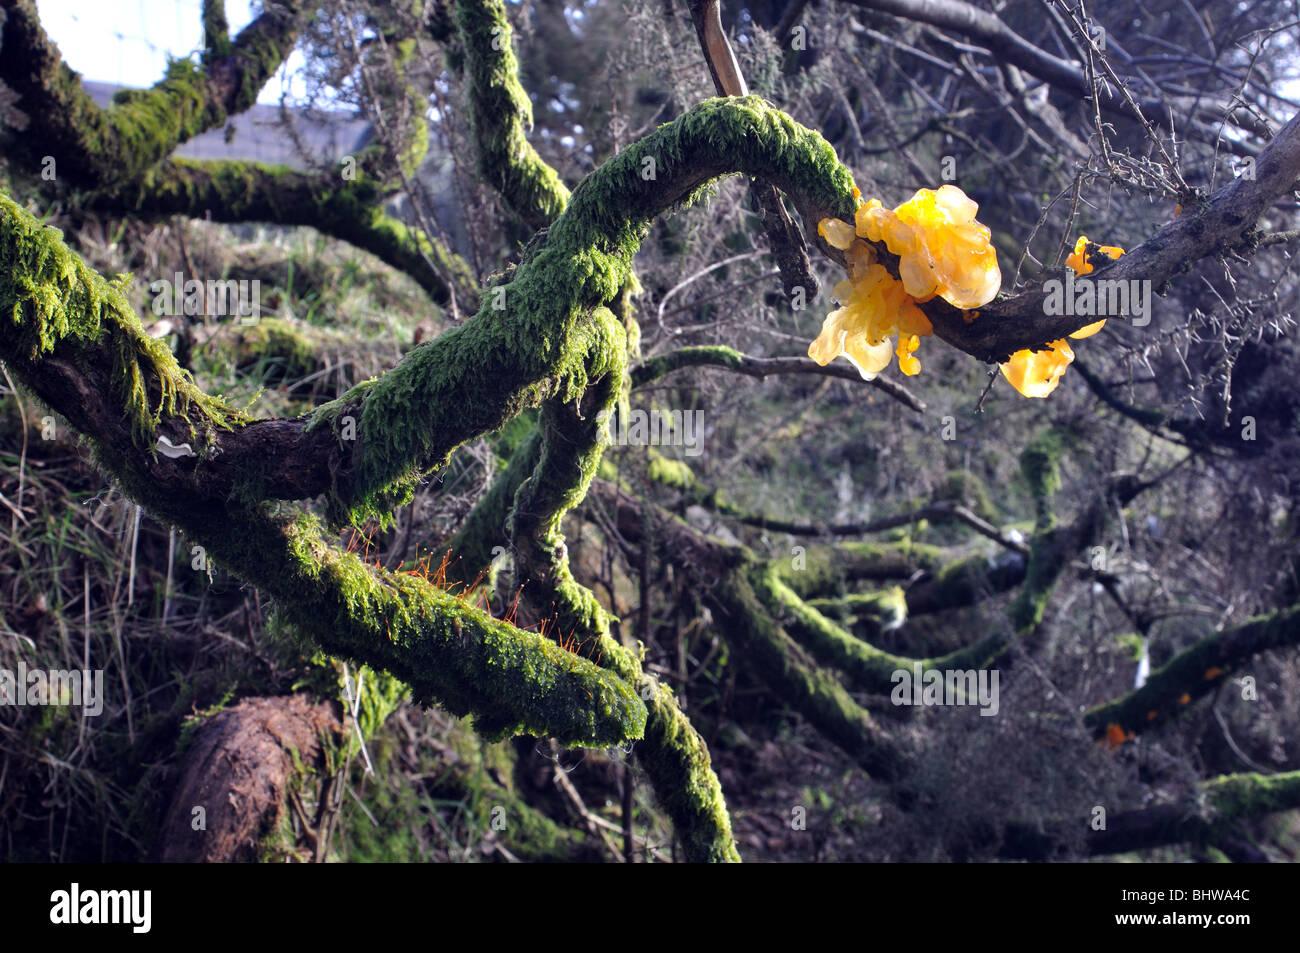 fungi yellow brain fungus, pembrokeshire, wales, great britain - Stock Image